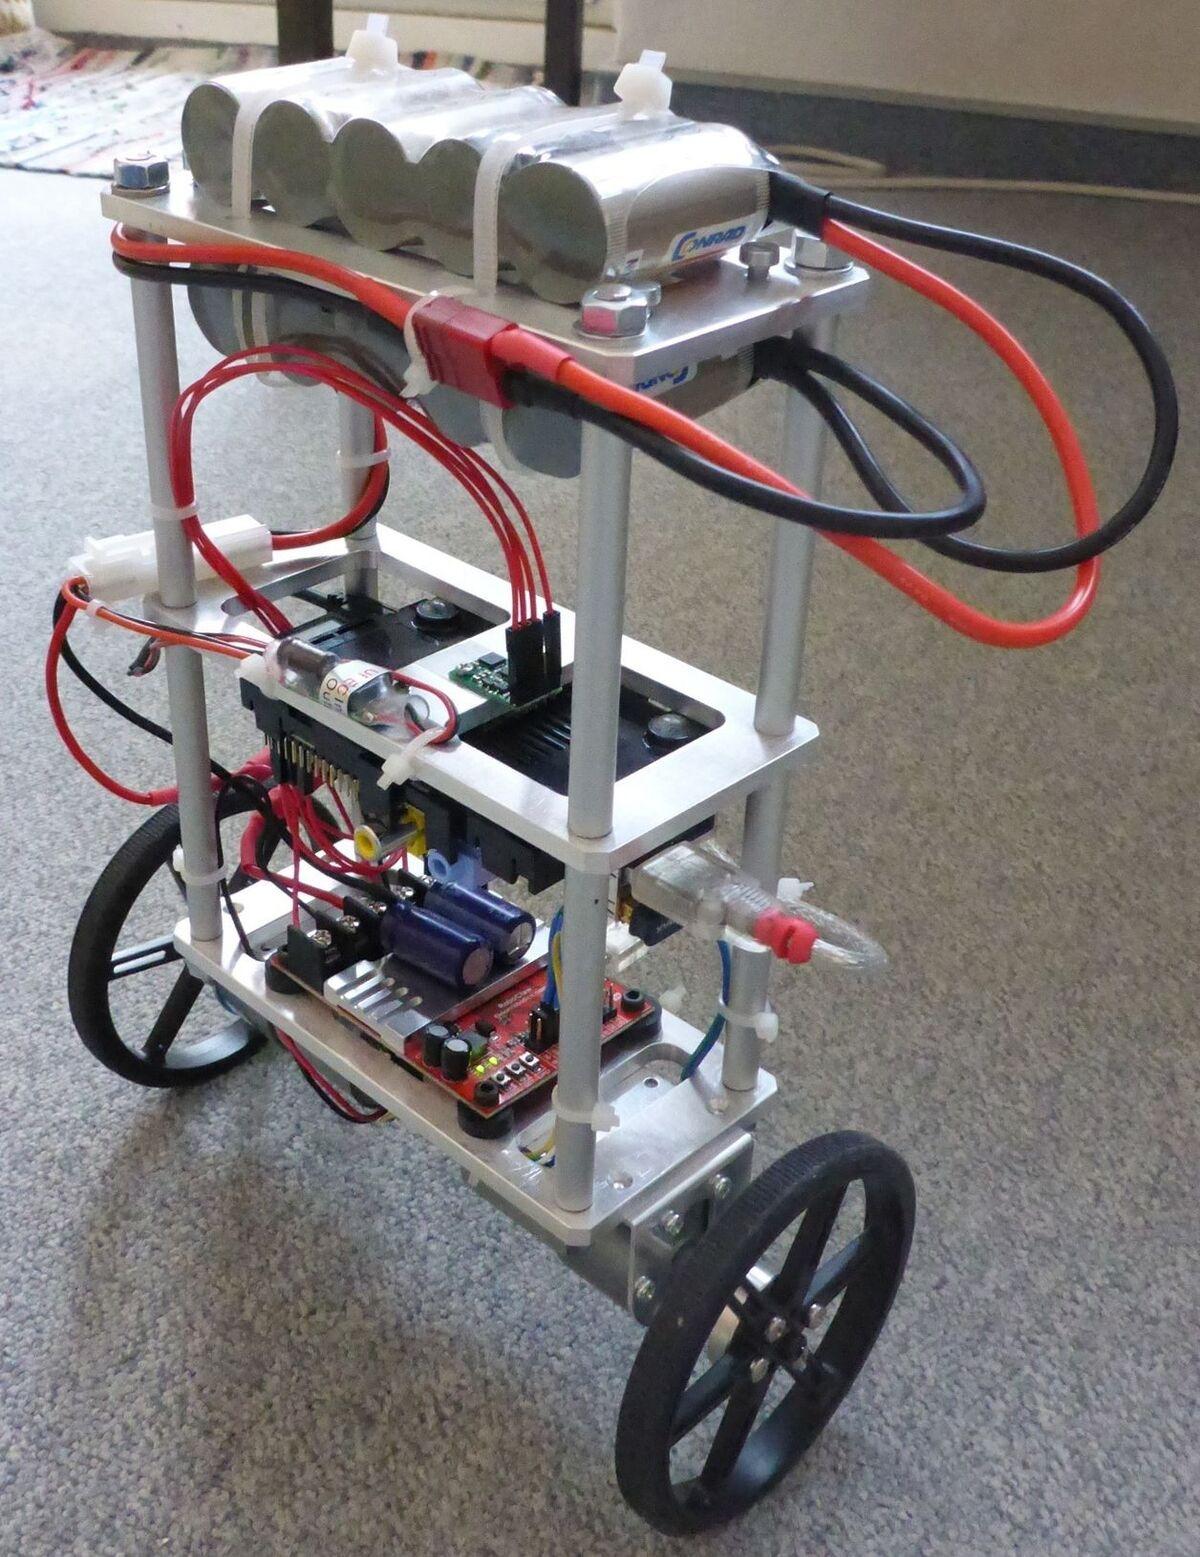 Astonishing Pololu Raspberry Pi Balancing Robot Wiring Cloud Cosmuggs Outletorg